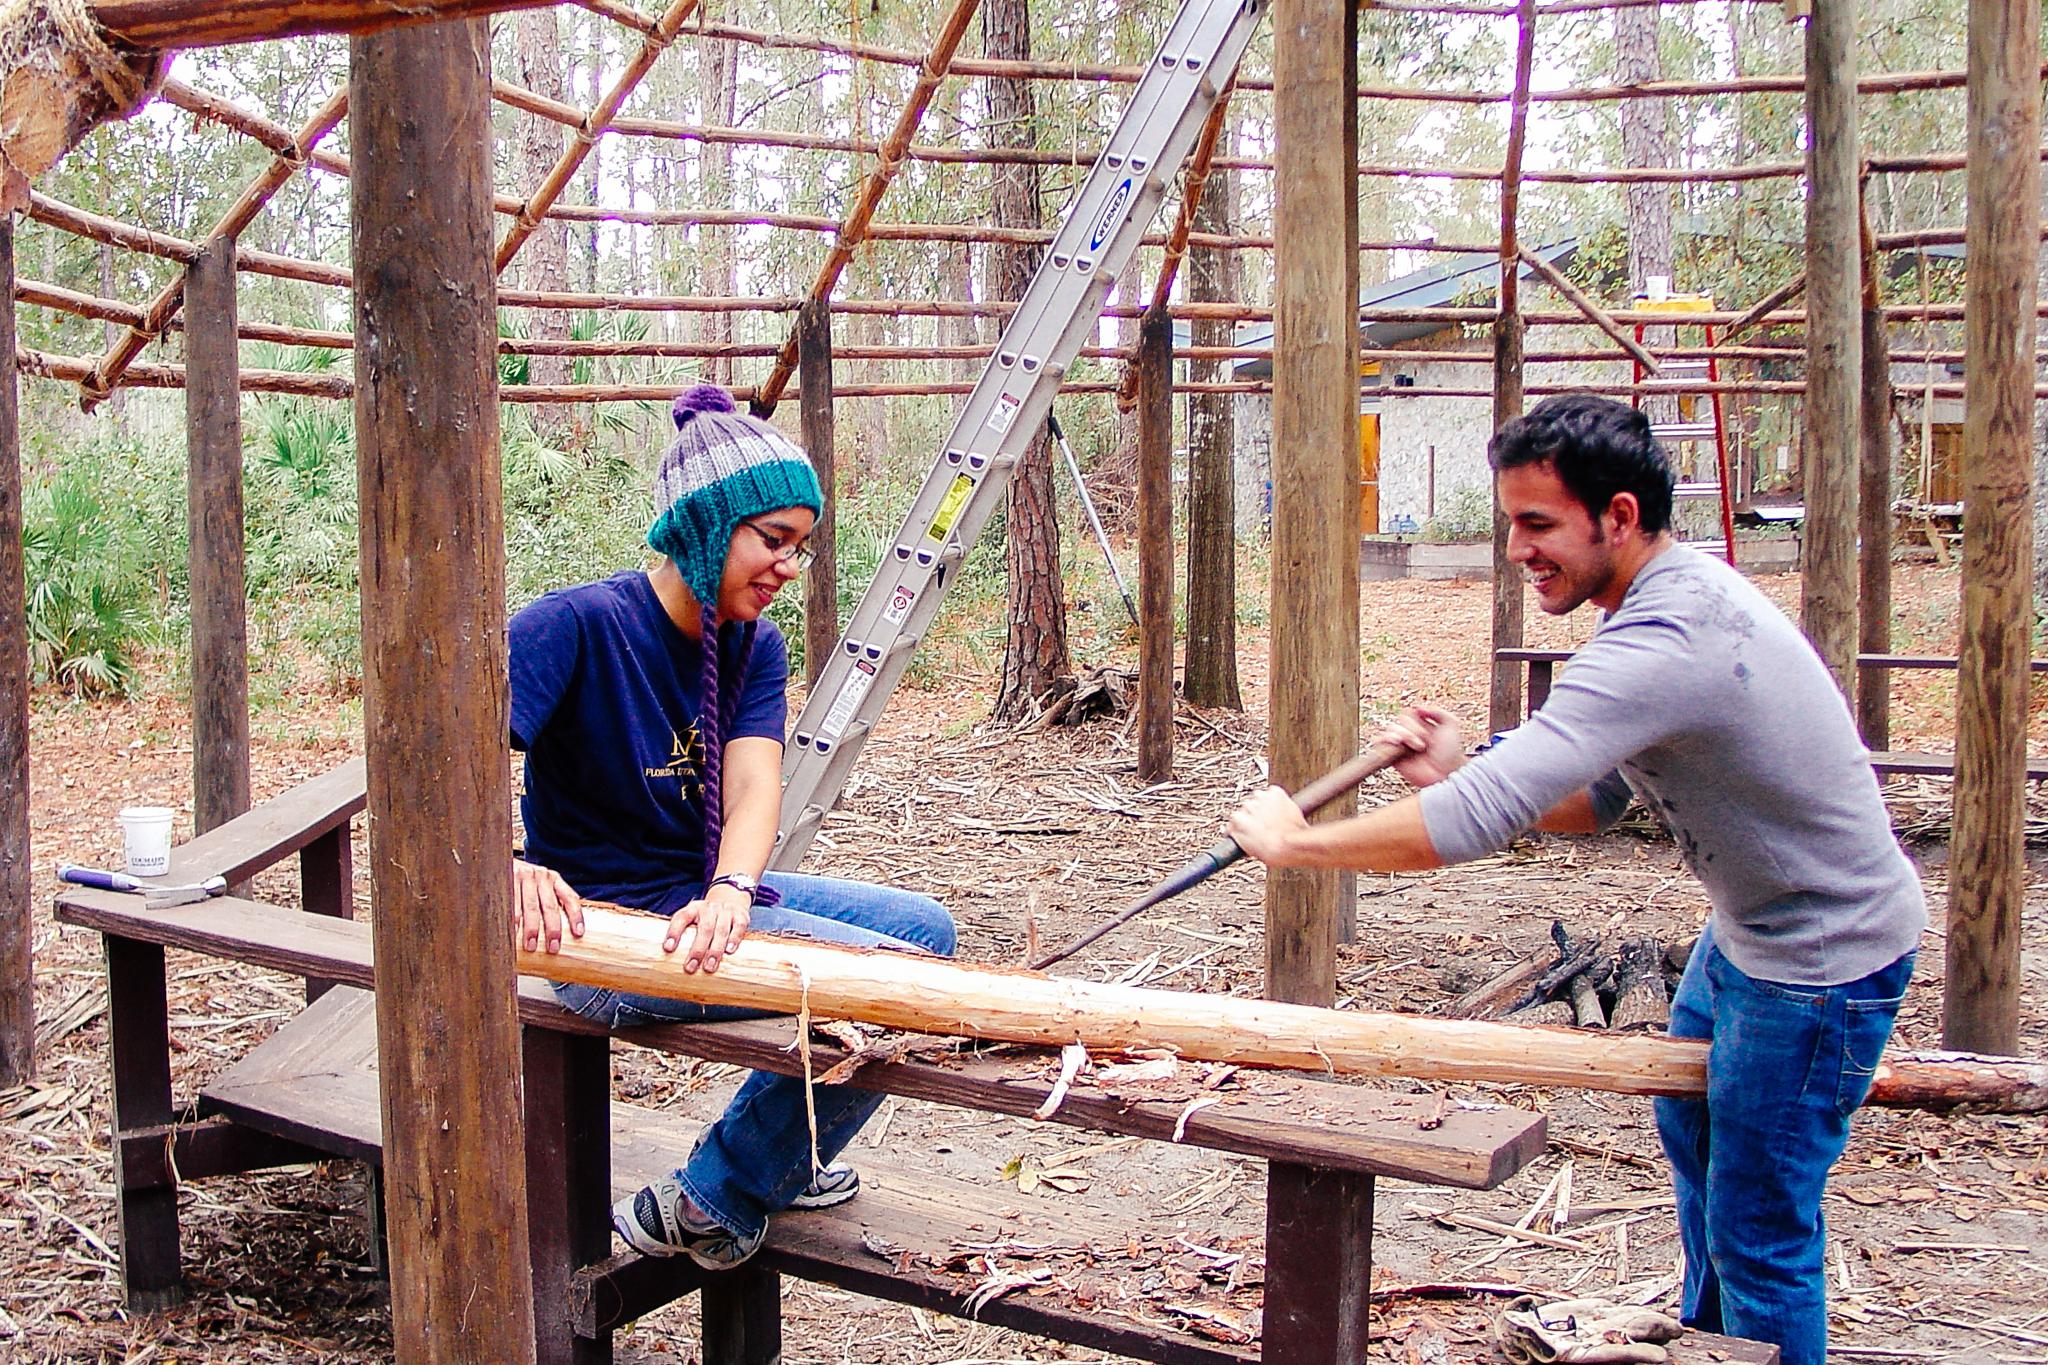 FIU Alternative Break Project-PRCA Breakfast Dec 2008 002-2.jpg